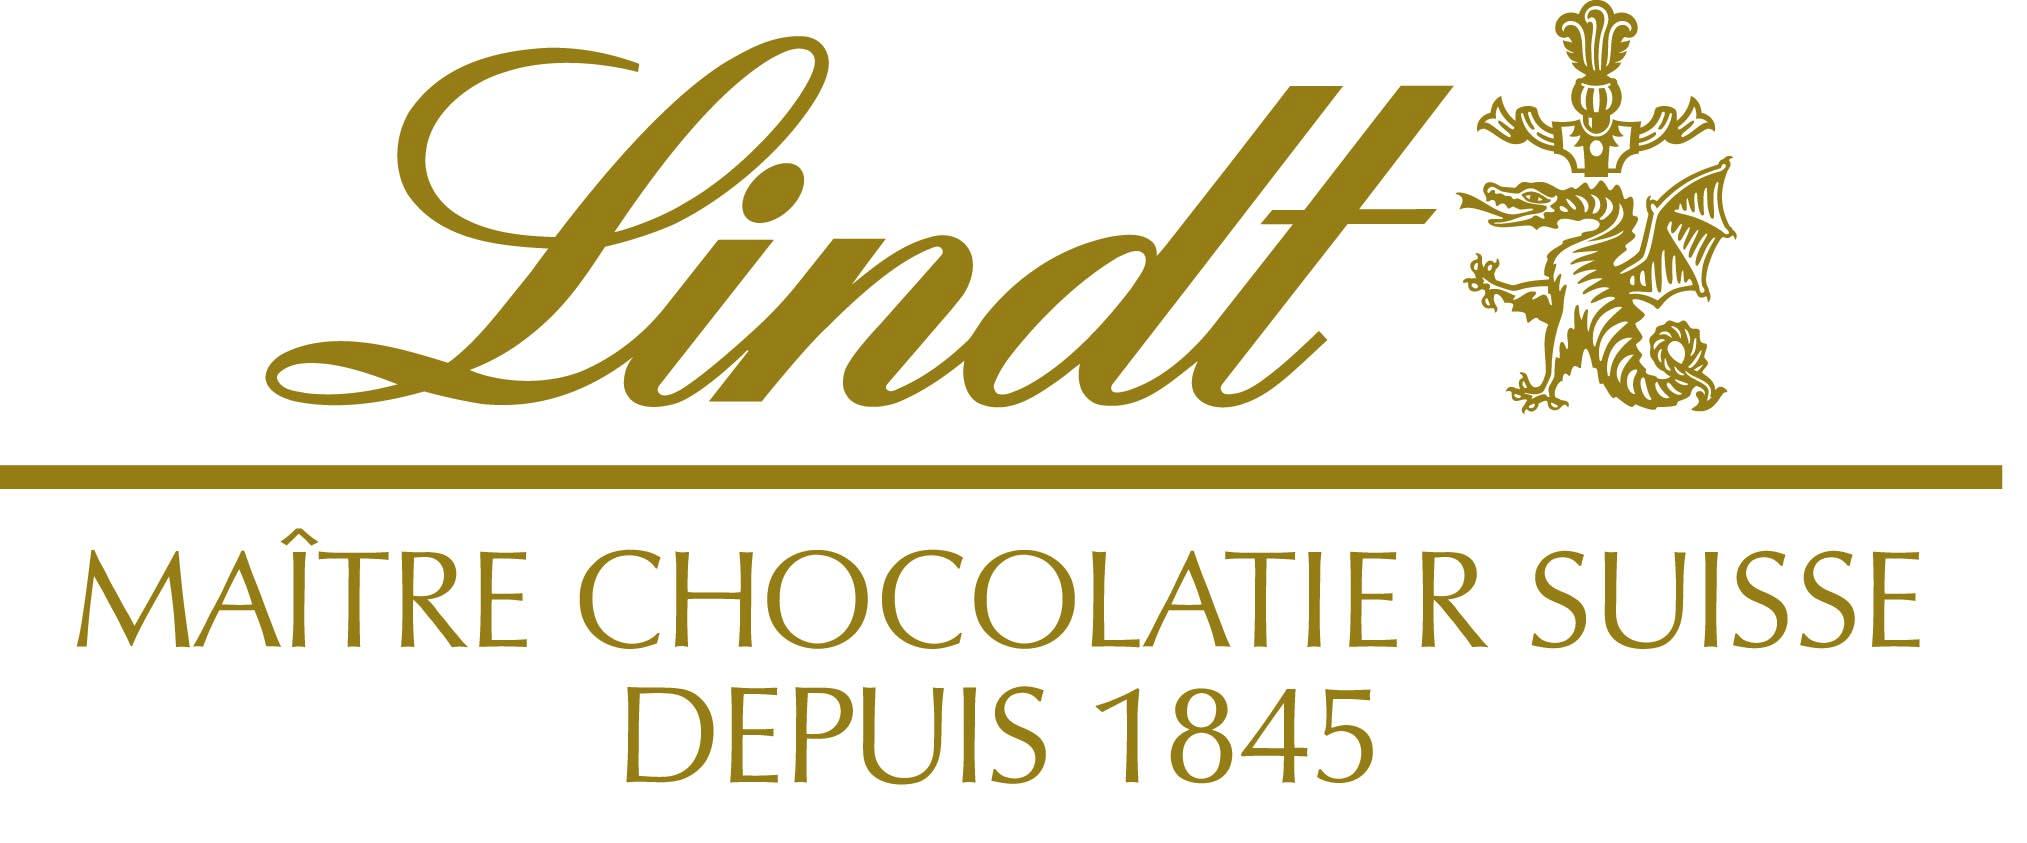 Lindt & Sprüngli AG, Kilchberg